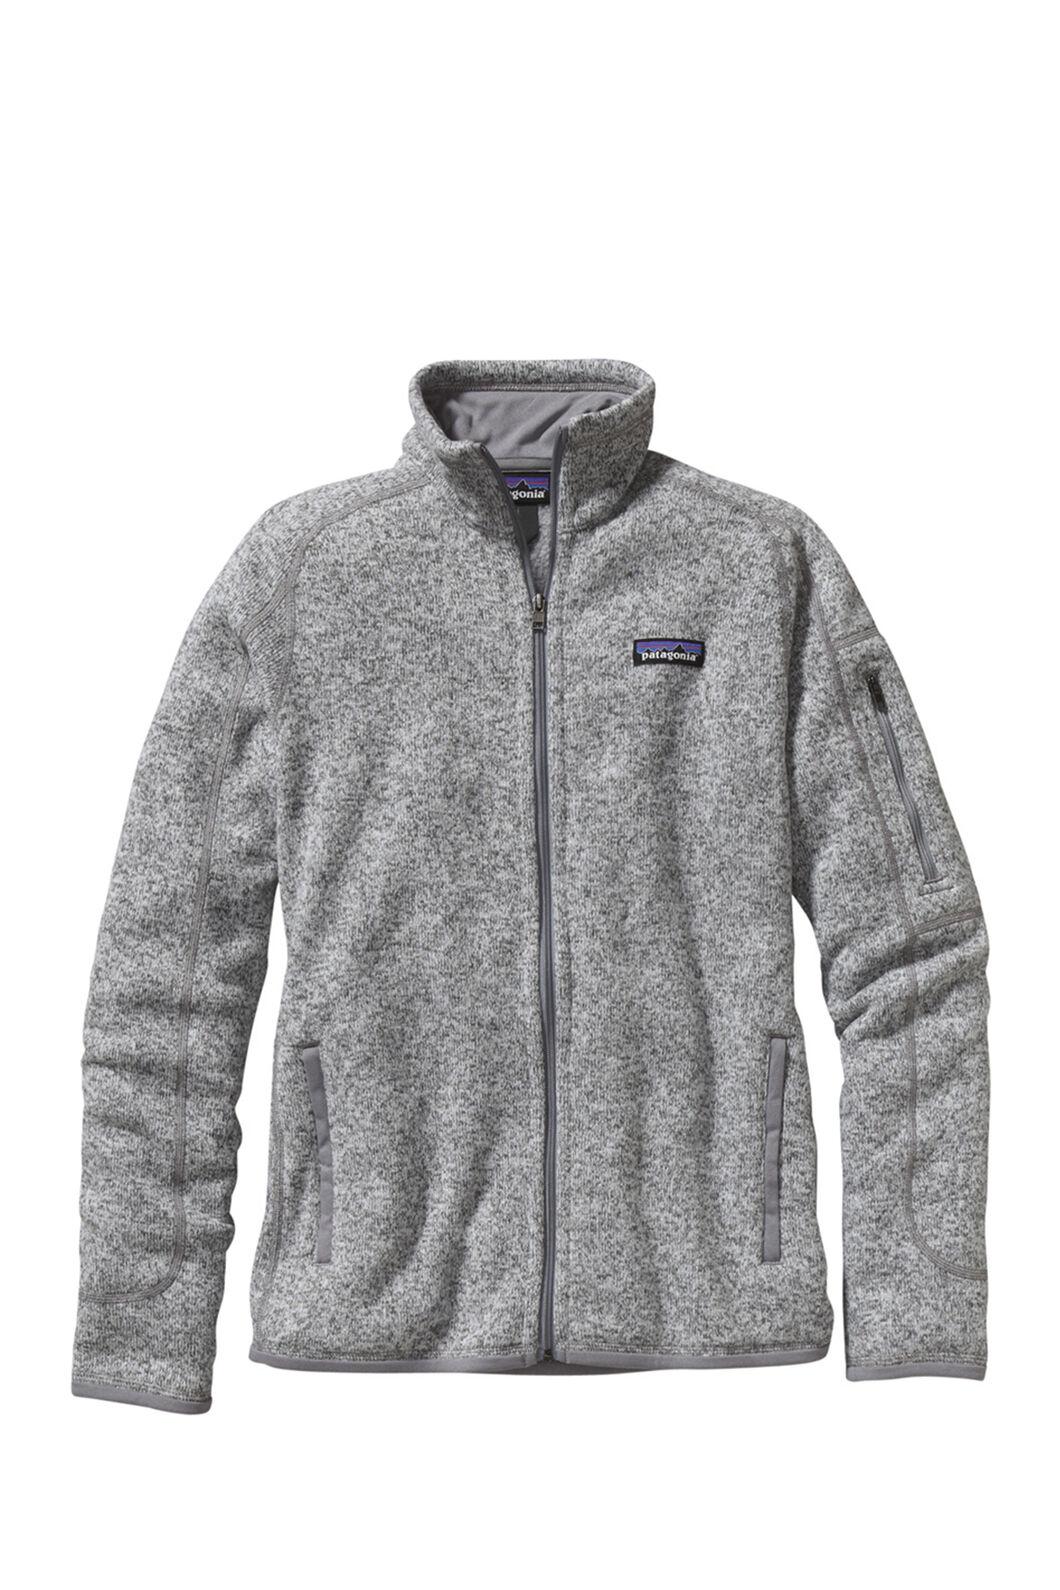 Patagonia Better Sweater Jacket — Women's, BIRCH WHITE, hi-res